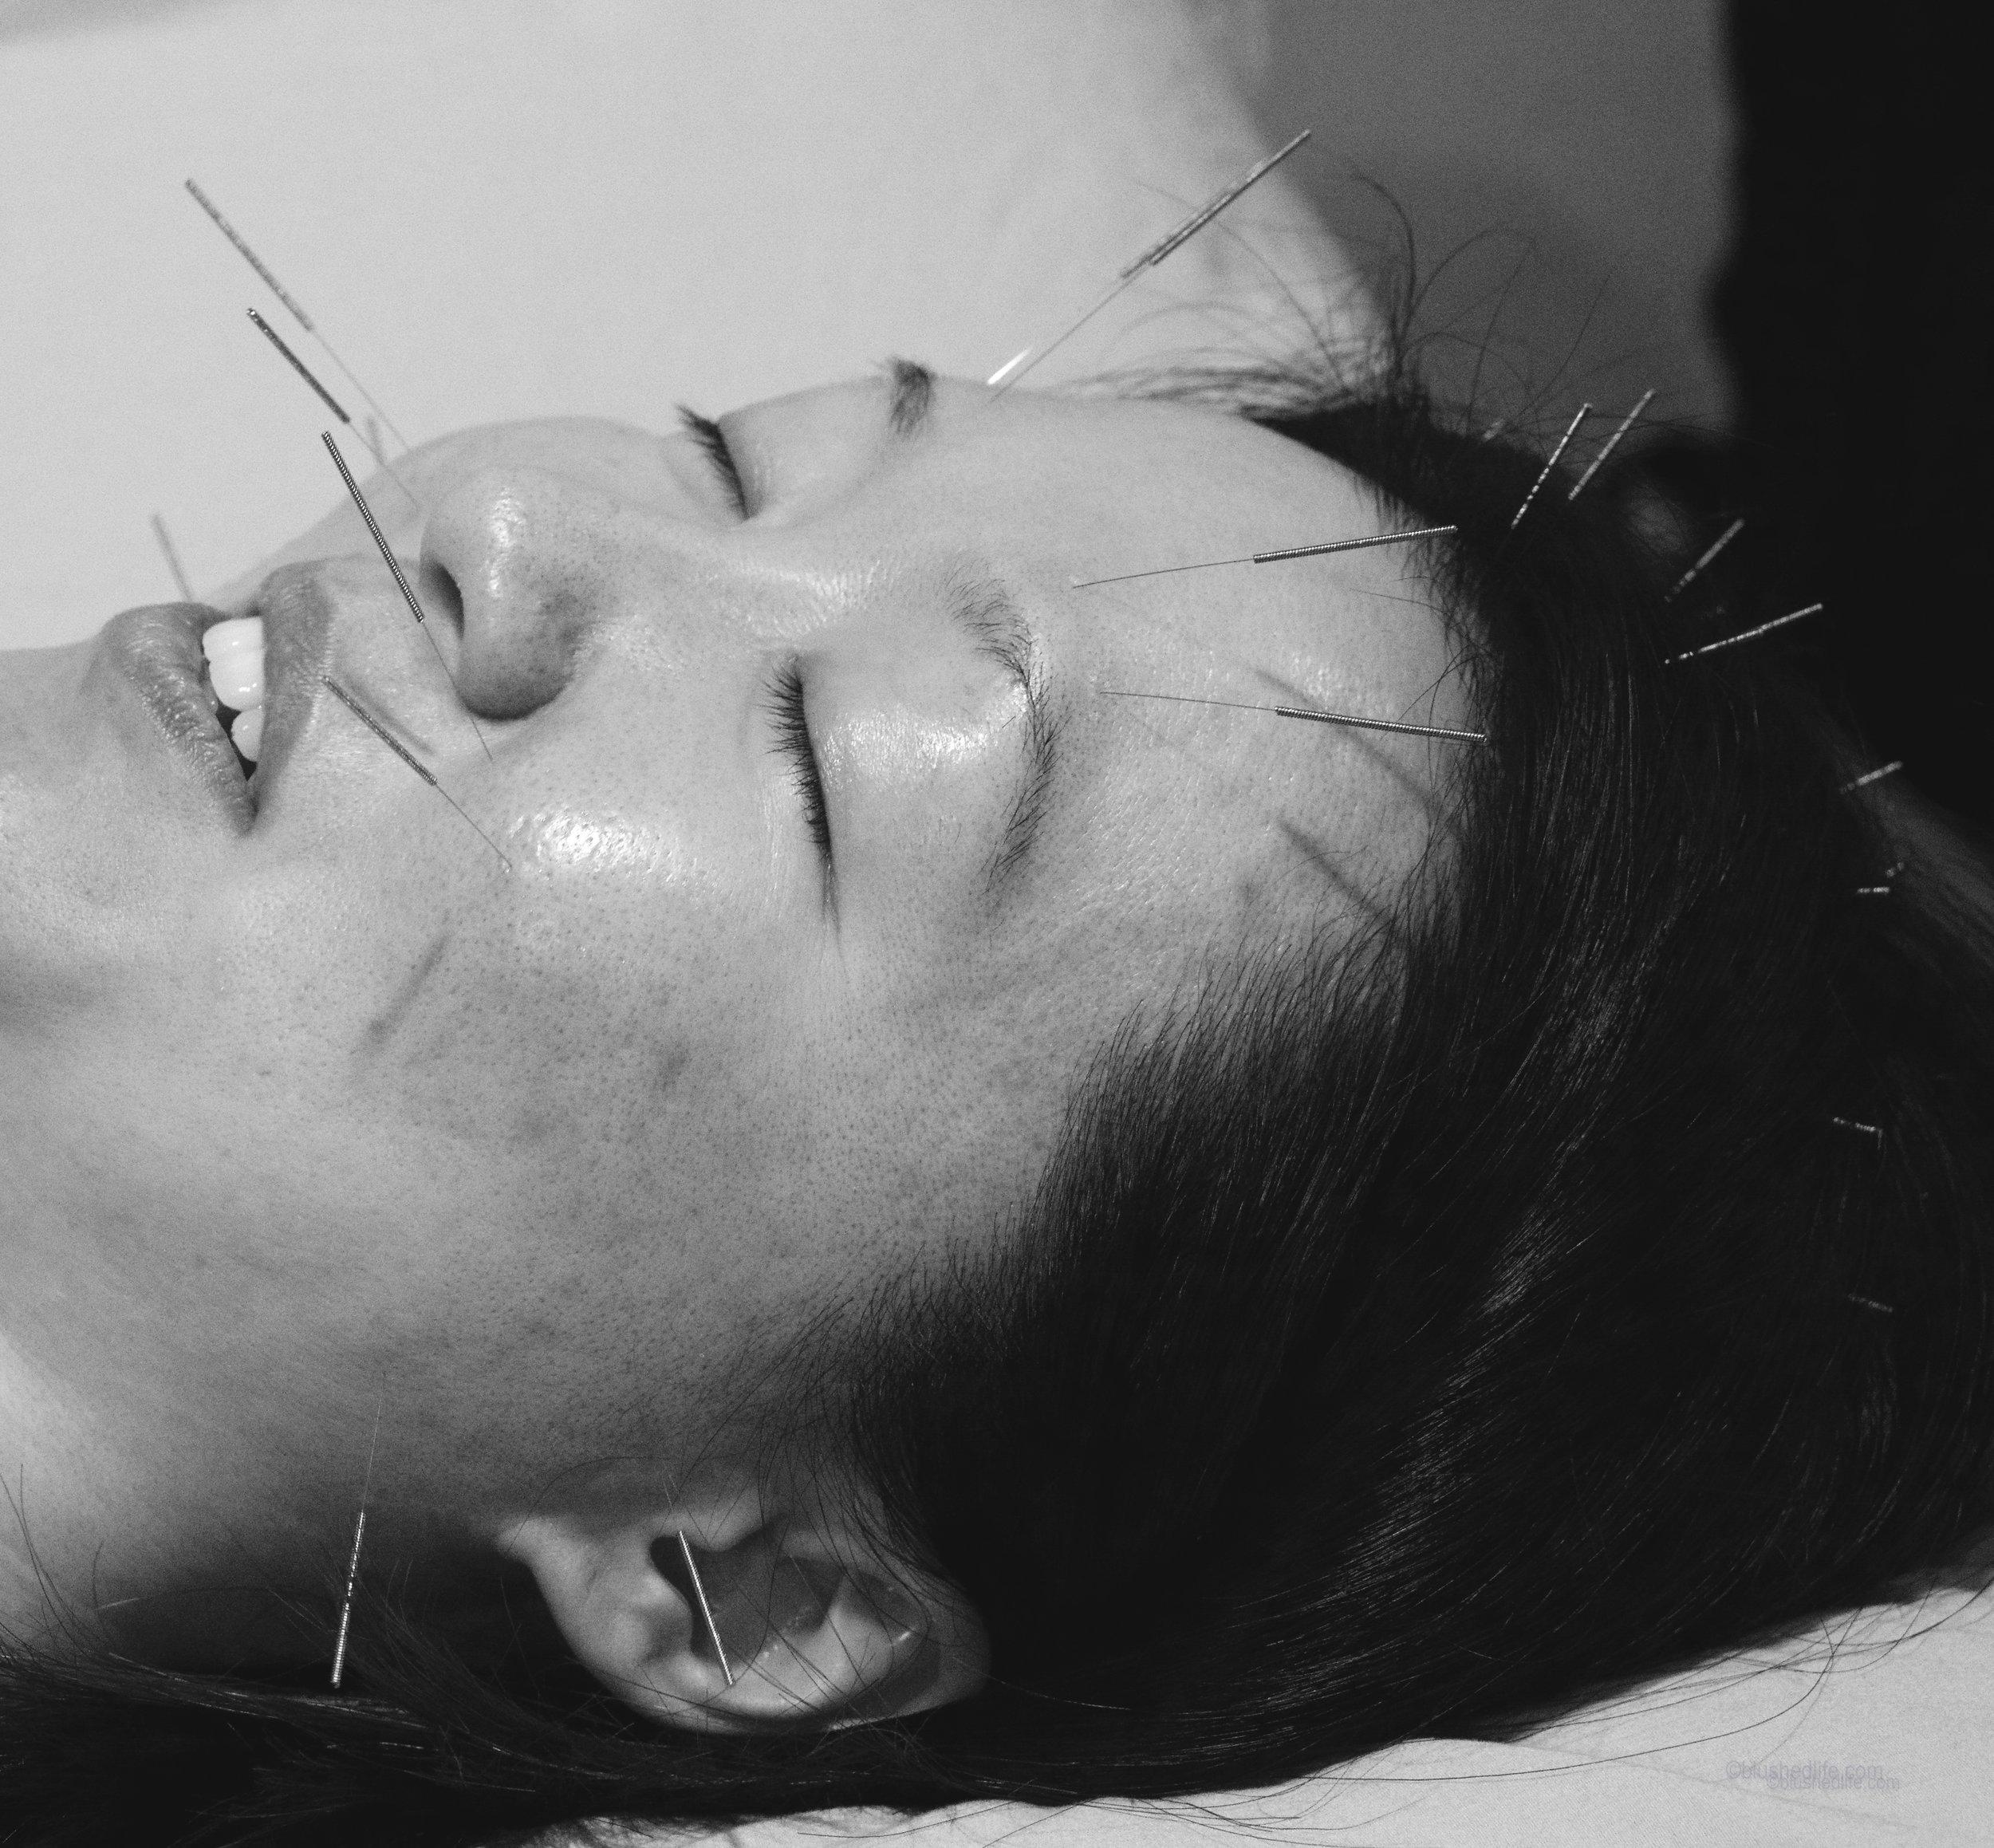 facial acupuncture acne pores_DSC07485-2-2.jpg